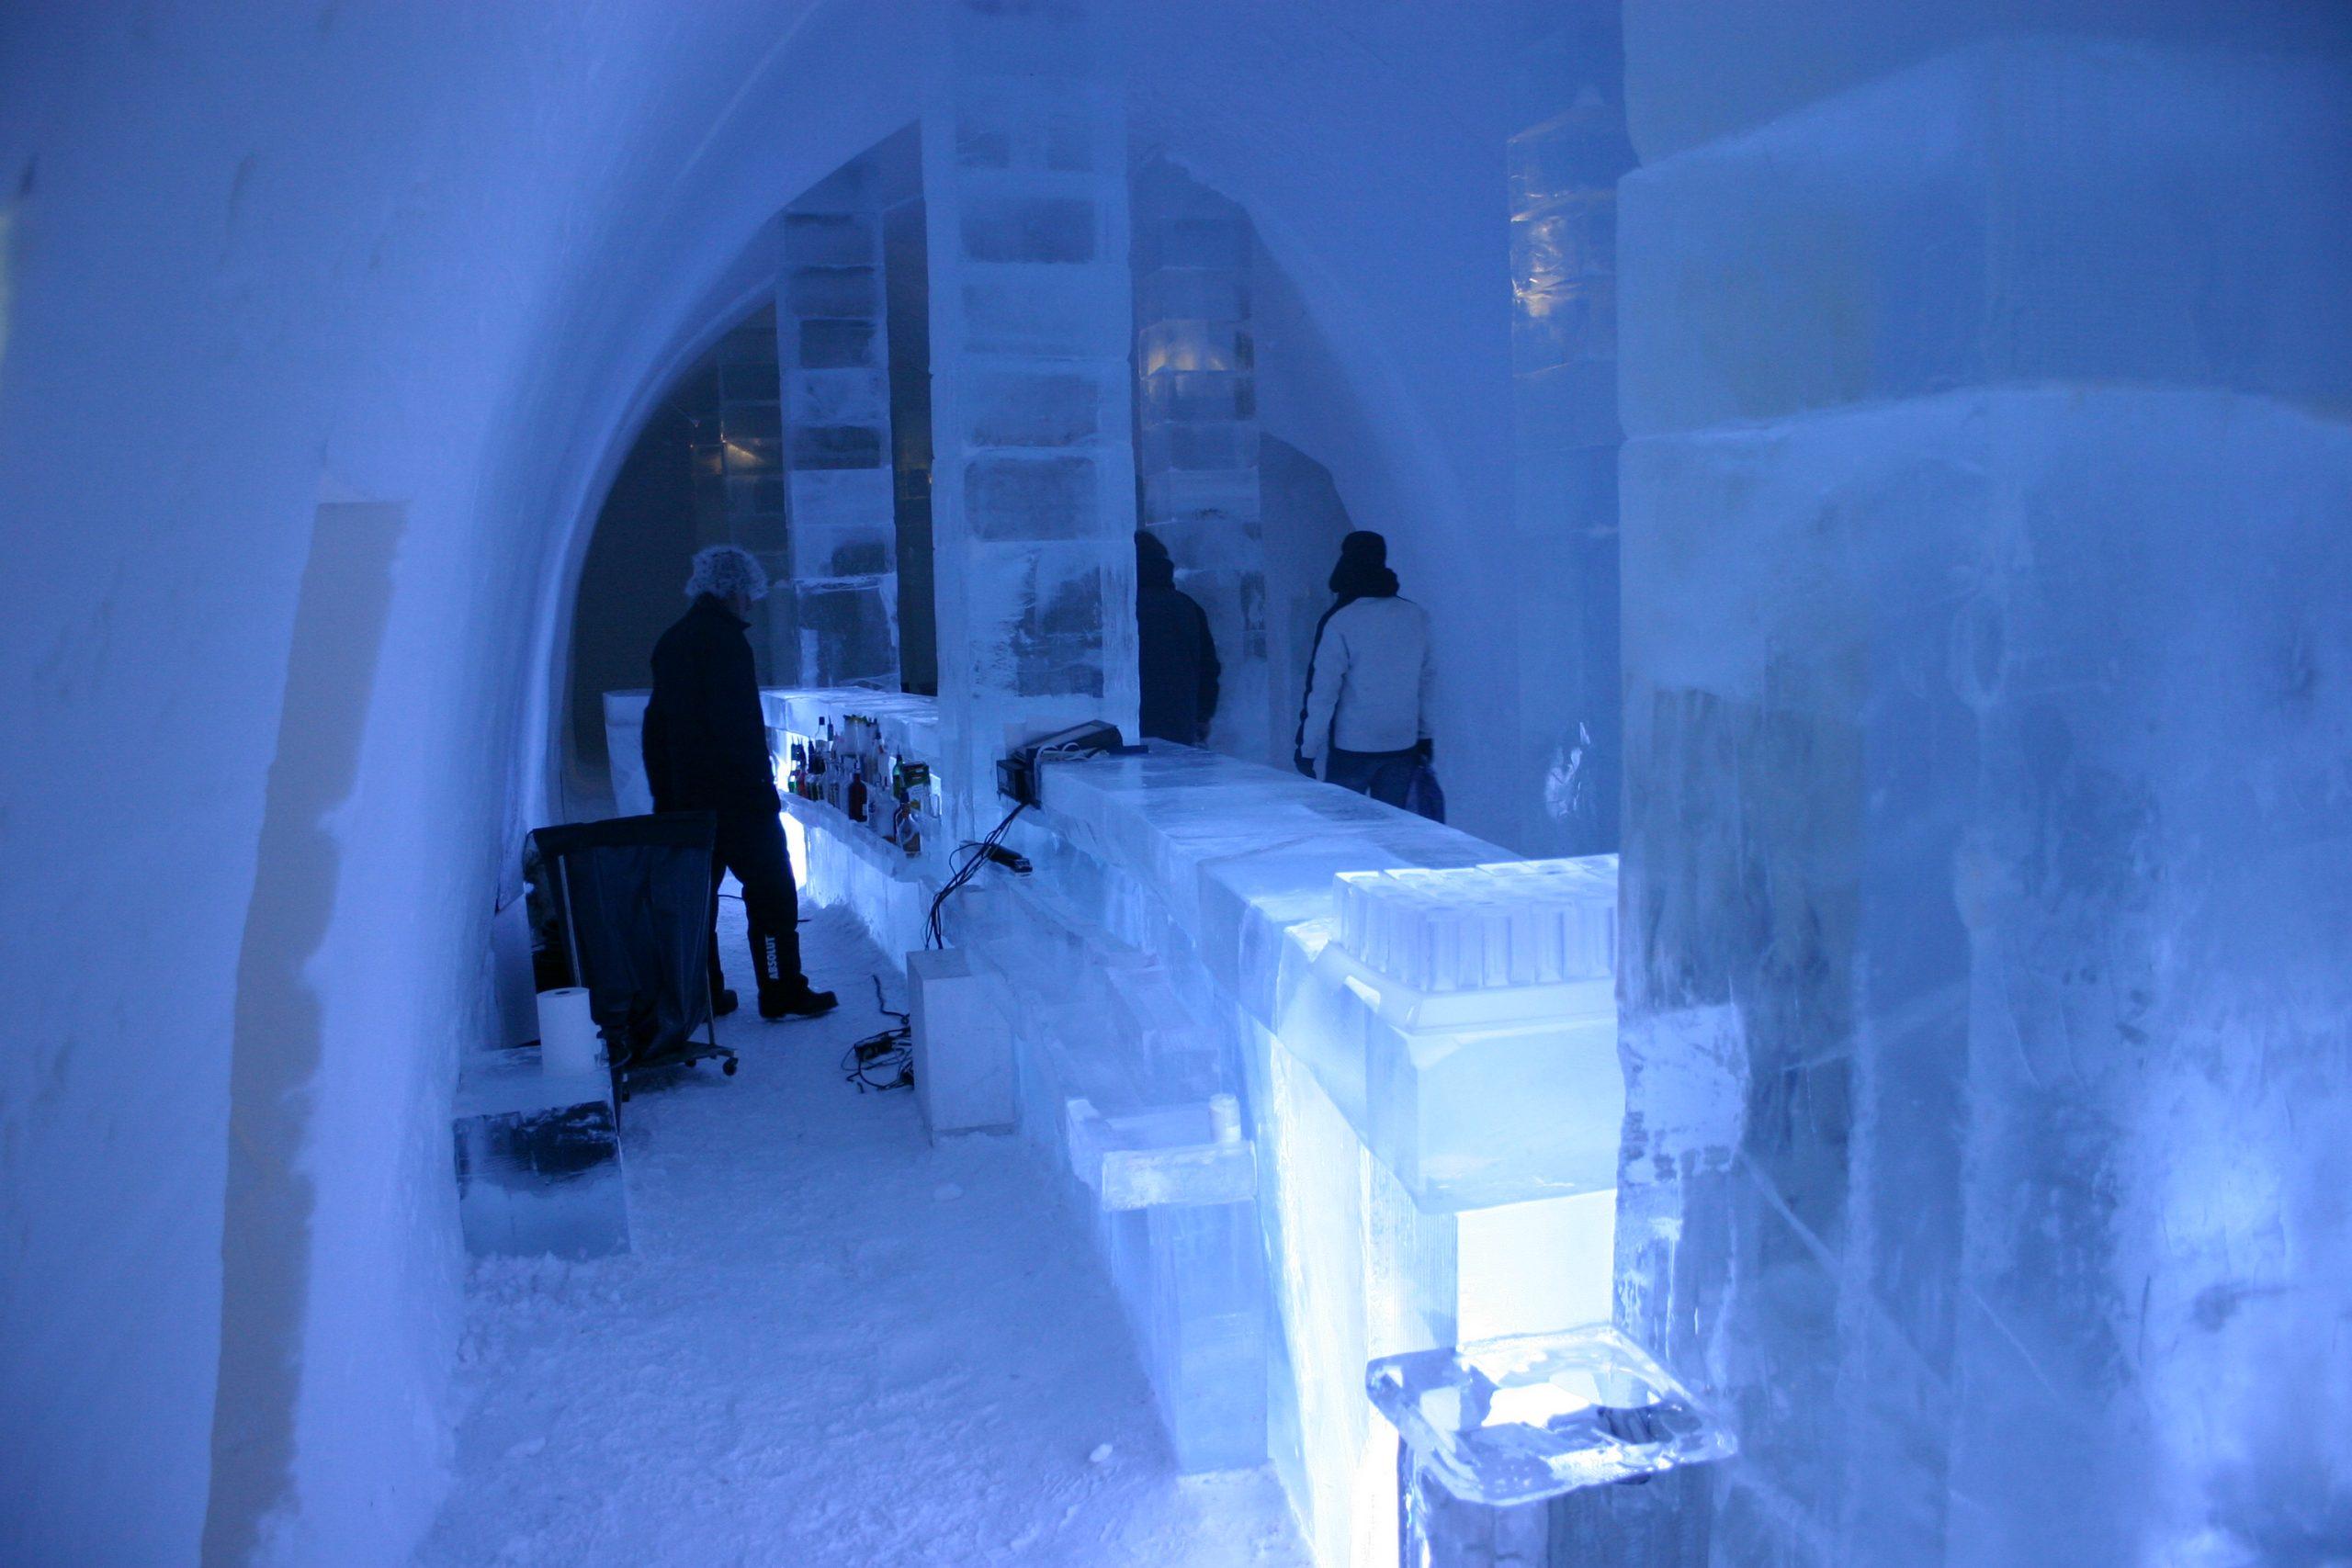 Kiruna and IceHotel of Jukkasjärvi: Popular Place to Visit in Sweden